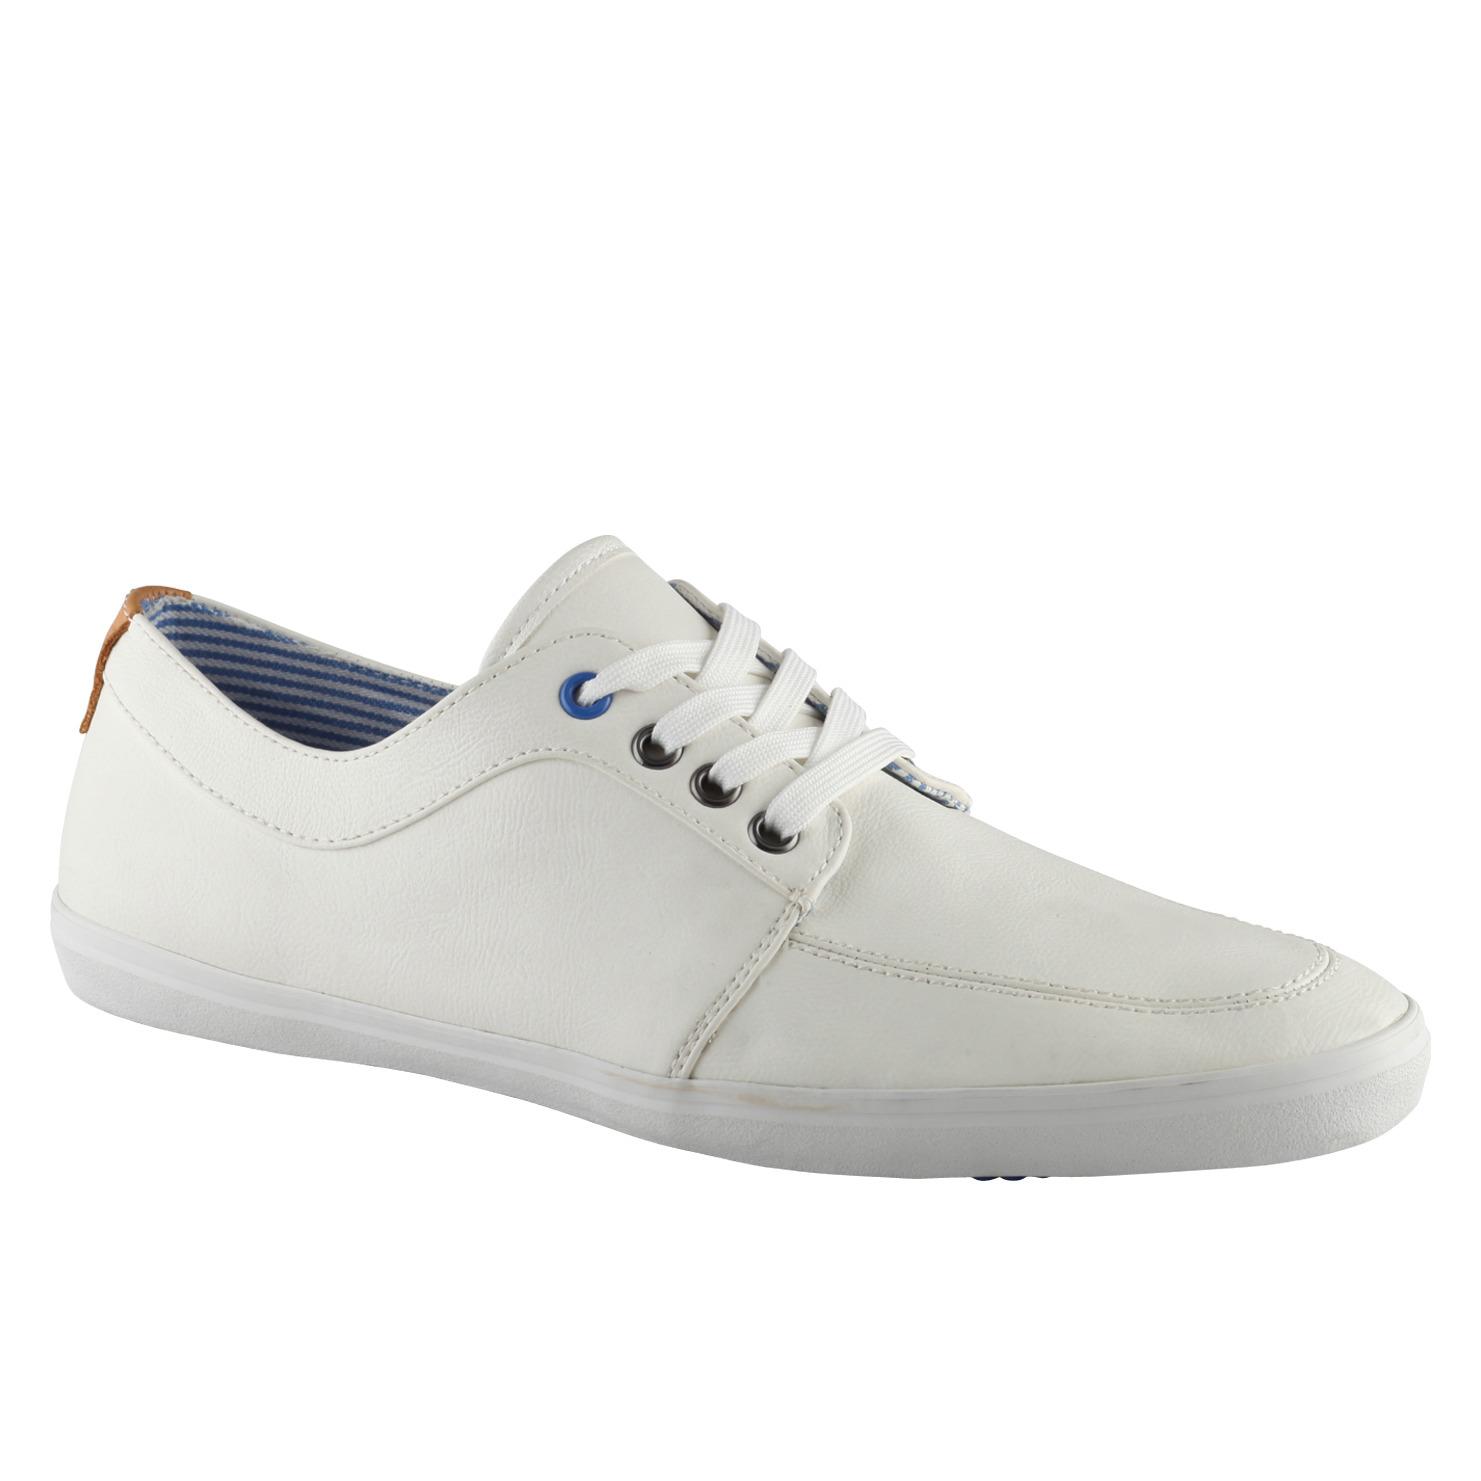 228e93058924c0 Lyst - ALDO Laskoskie in White for Men